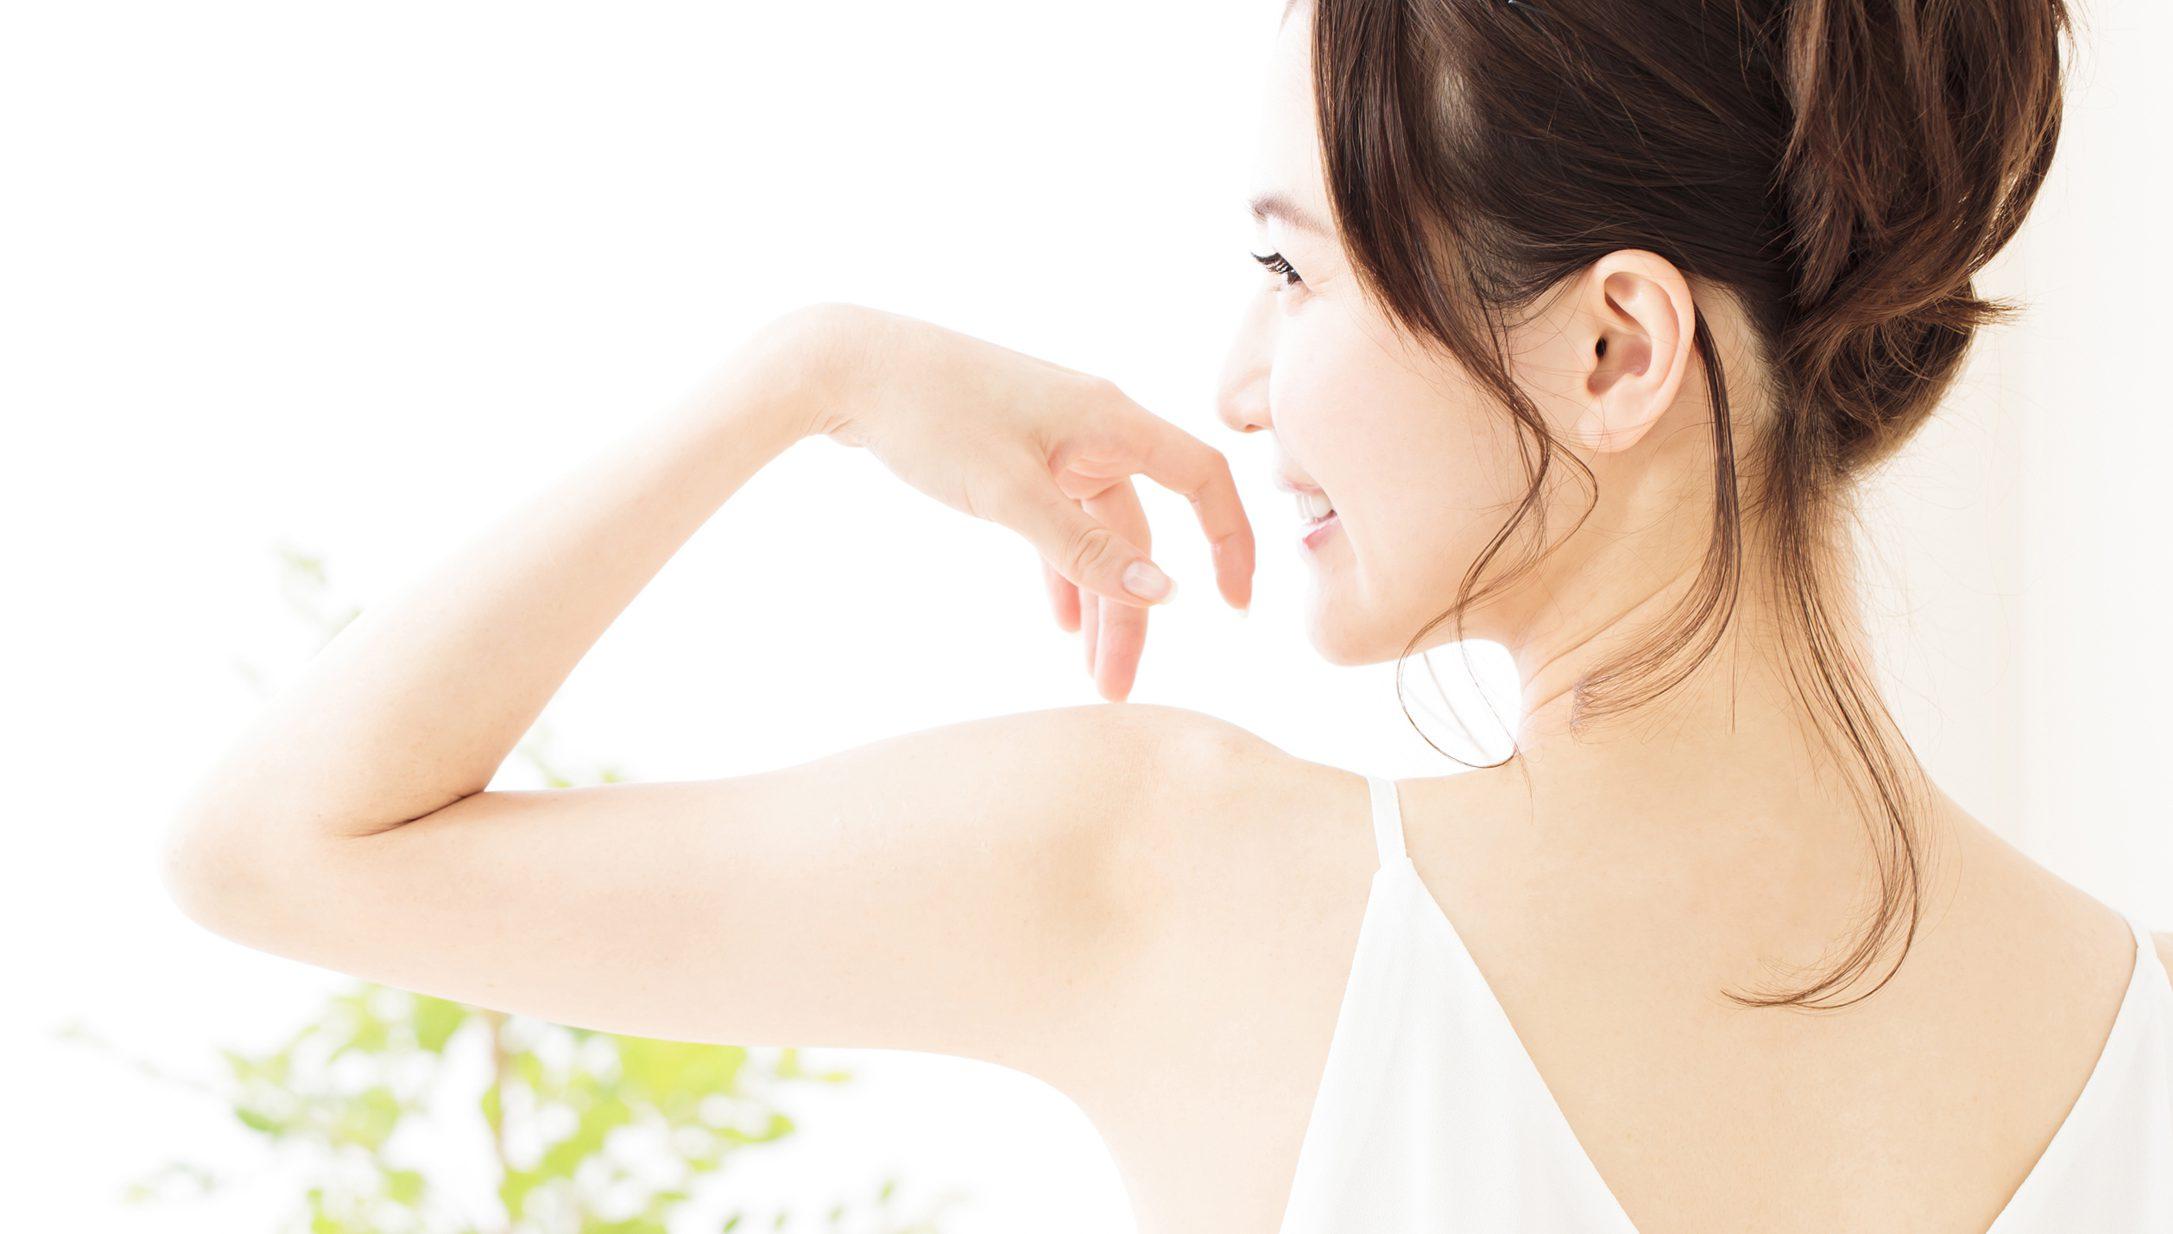 02_datsumo